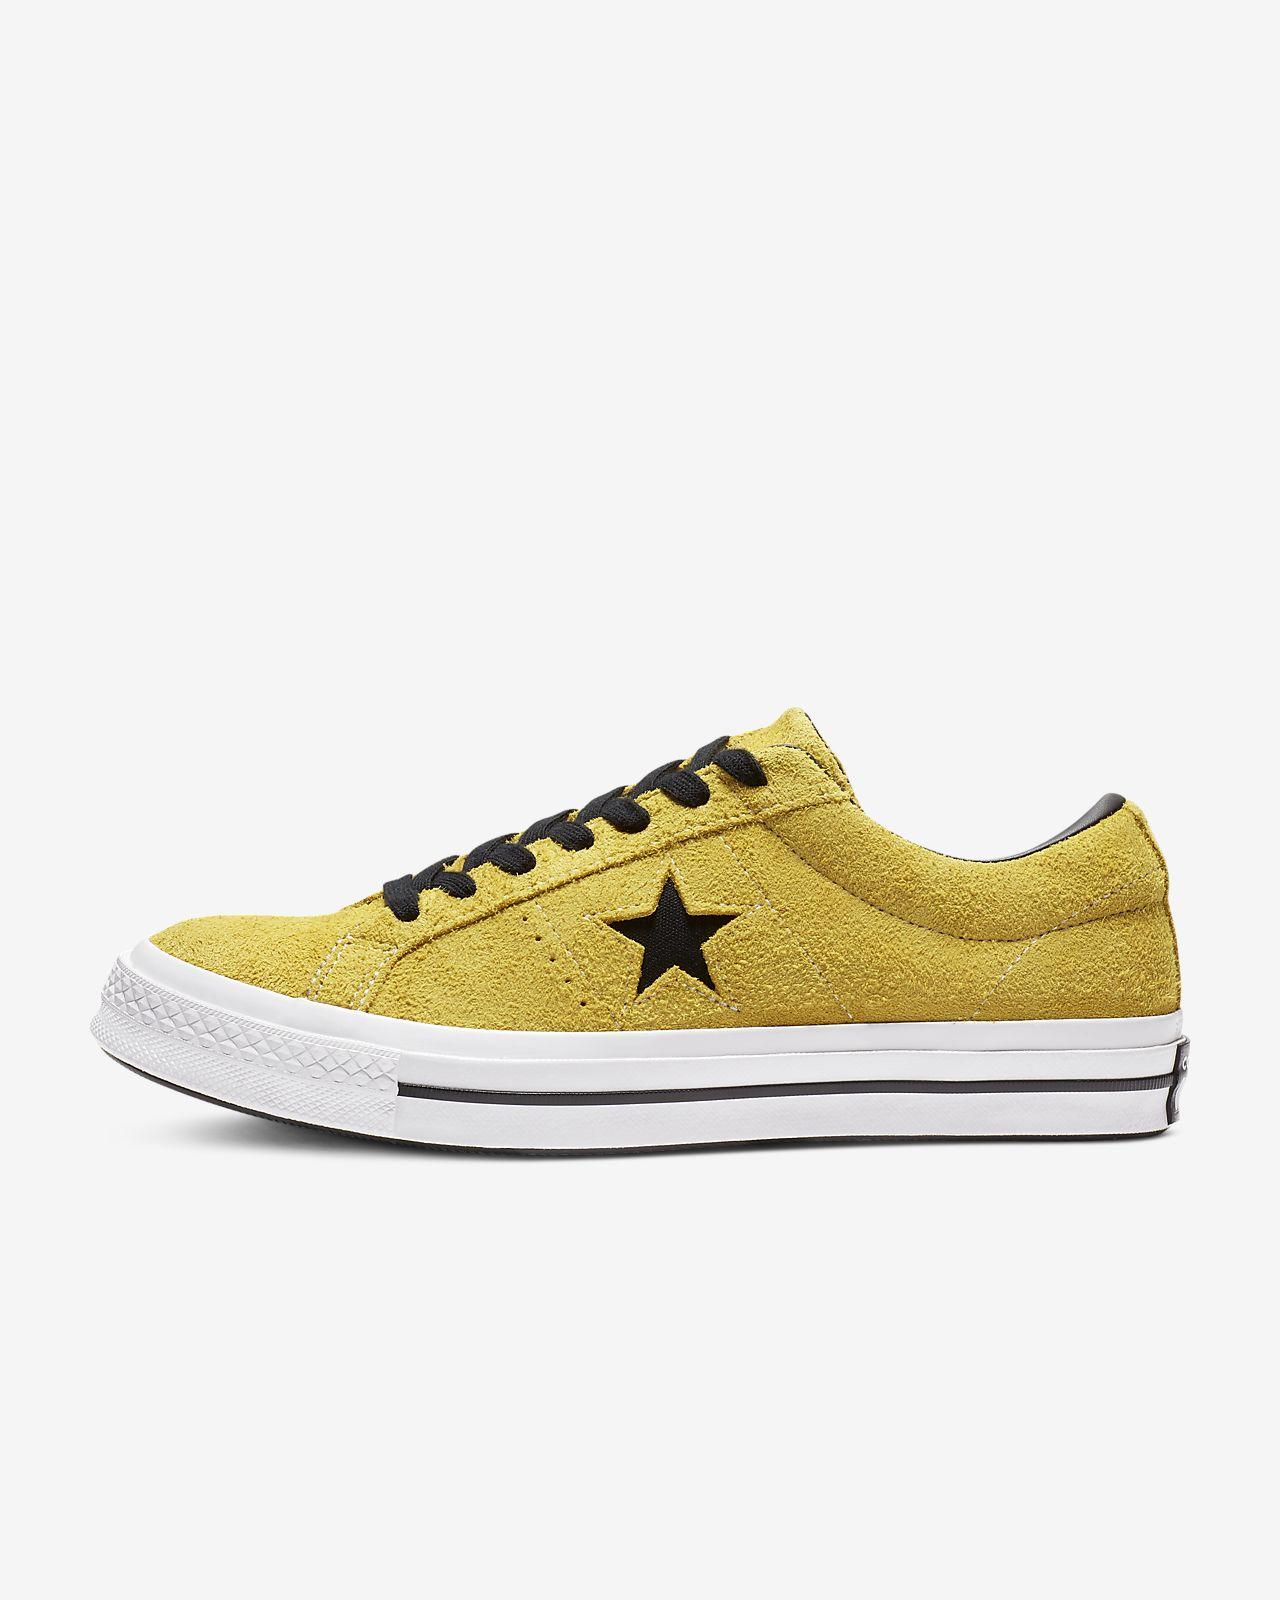 One Star Dark Star Vintage Suede Low Top  Unisex Shoe